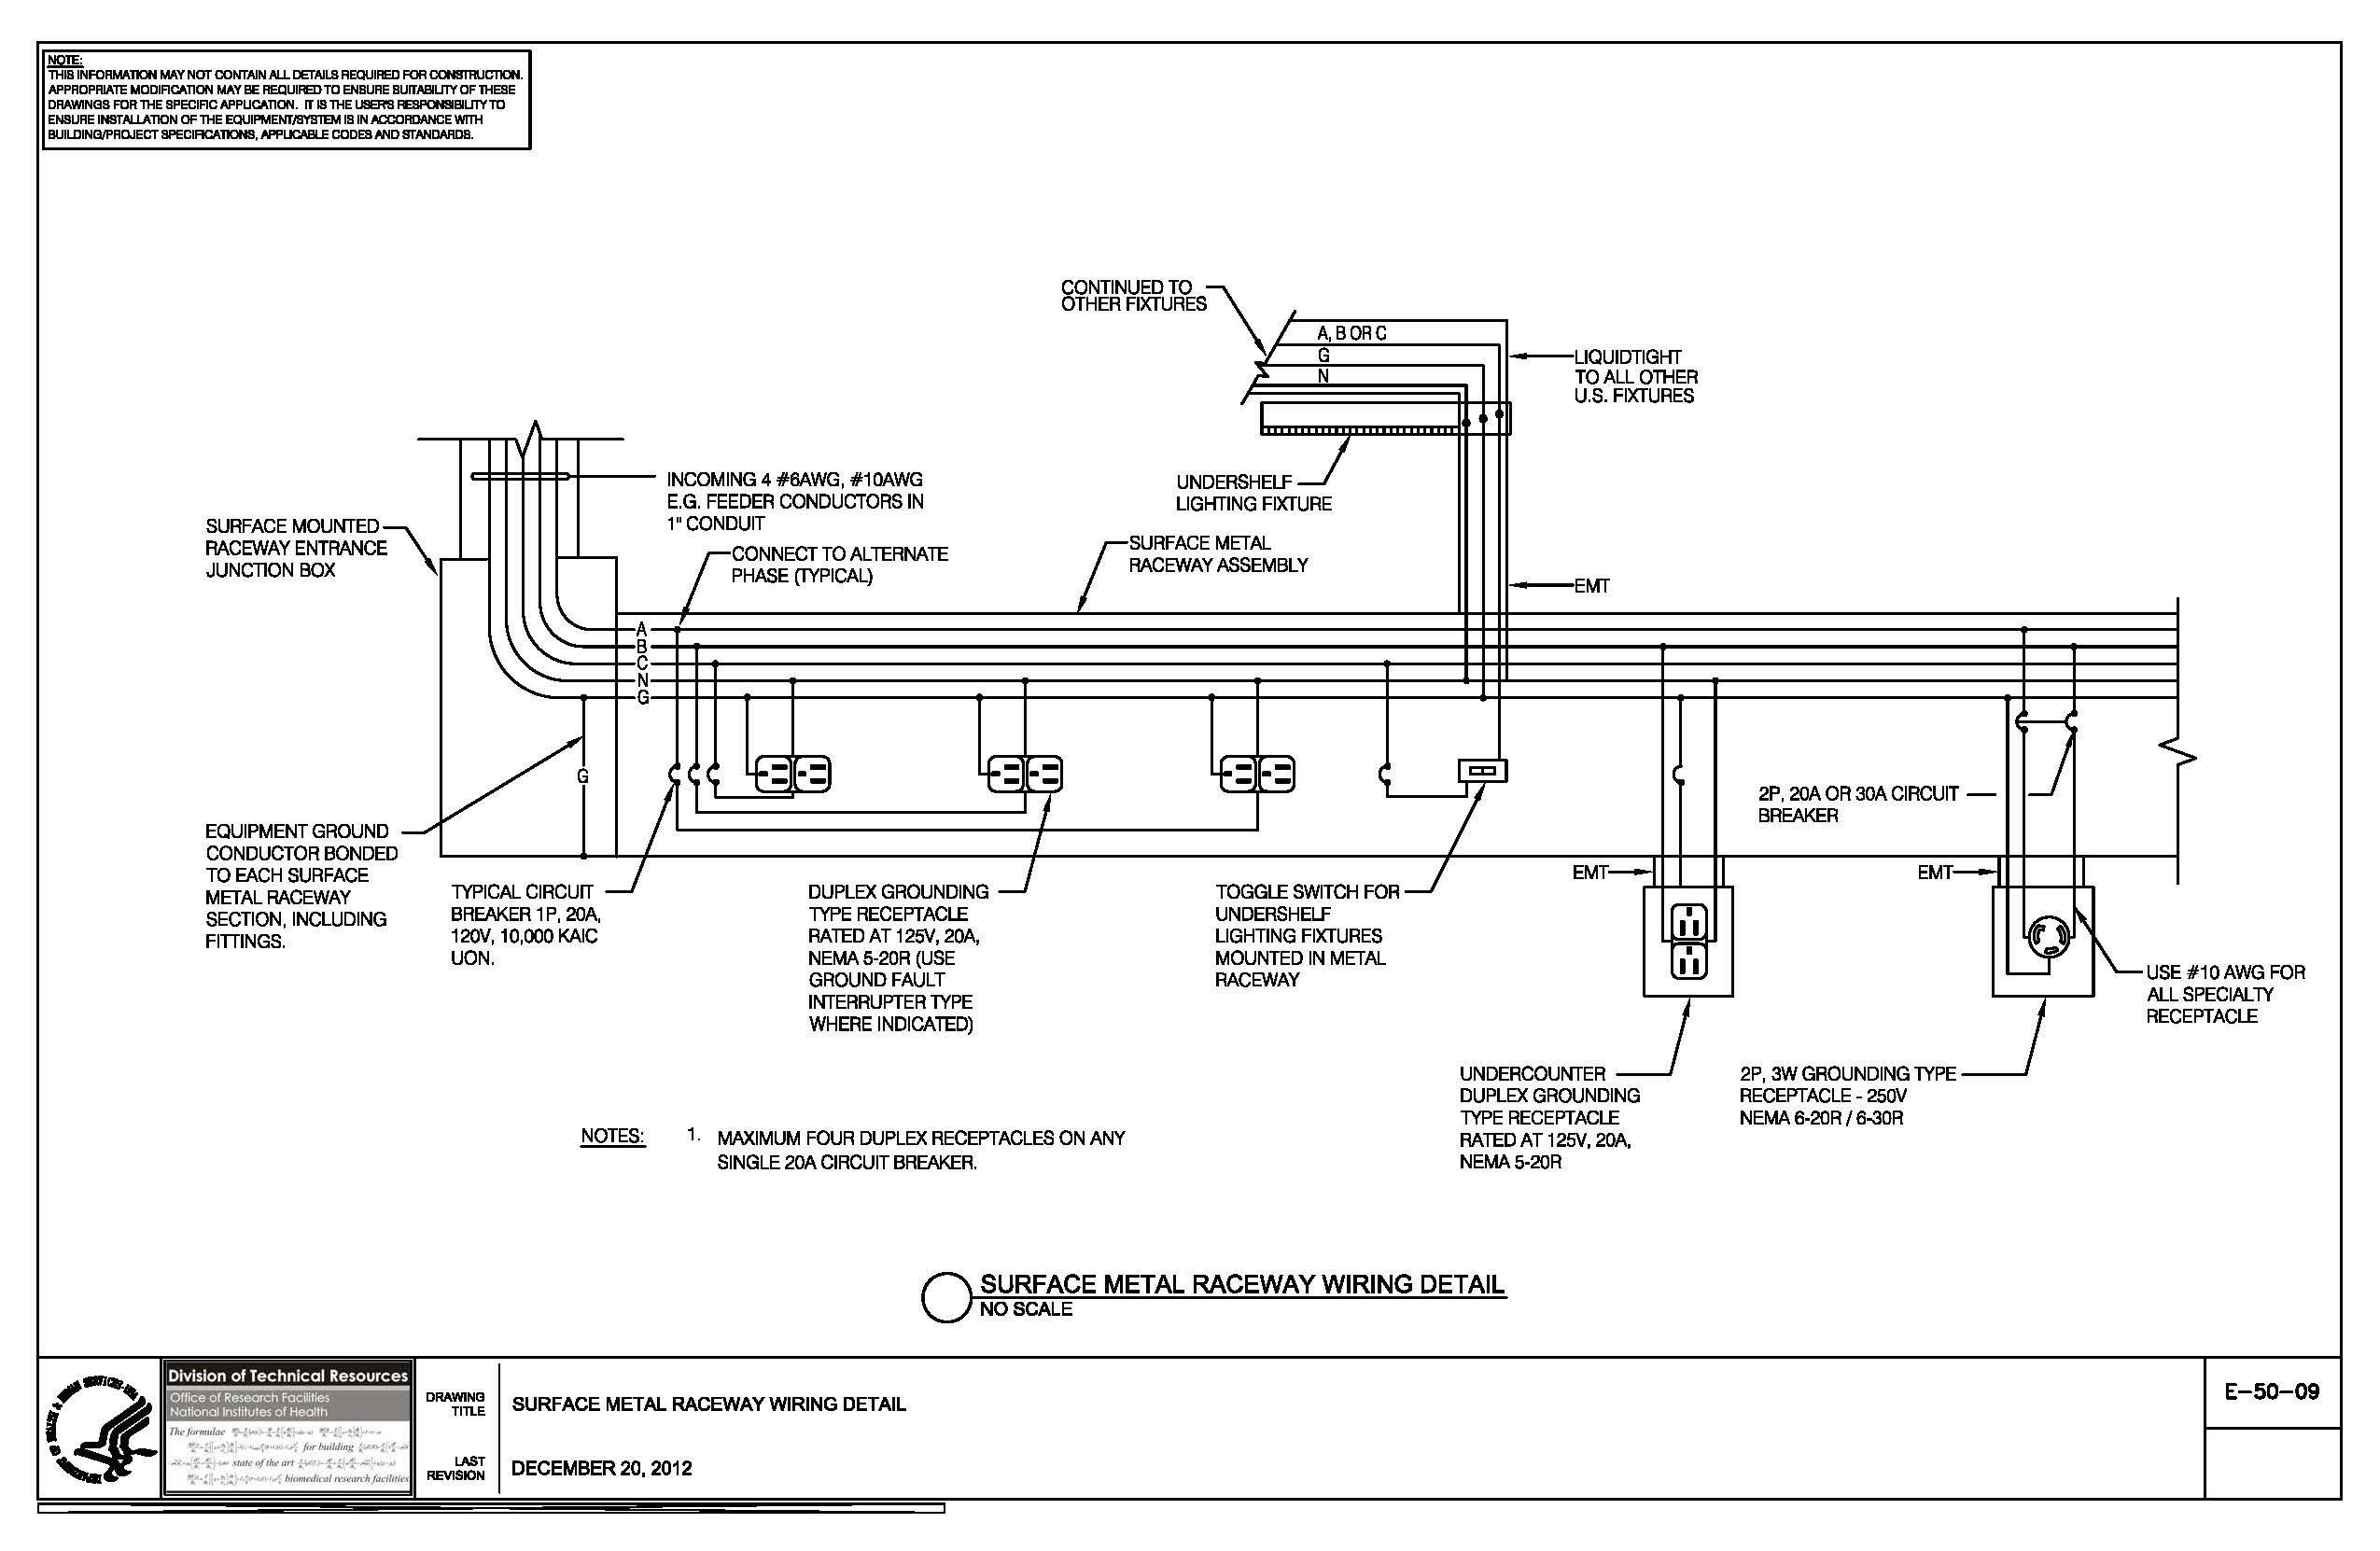 Light Fixture Wiring Diagram Fresh Nih Standard Cad Details